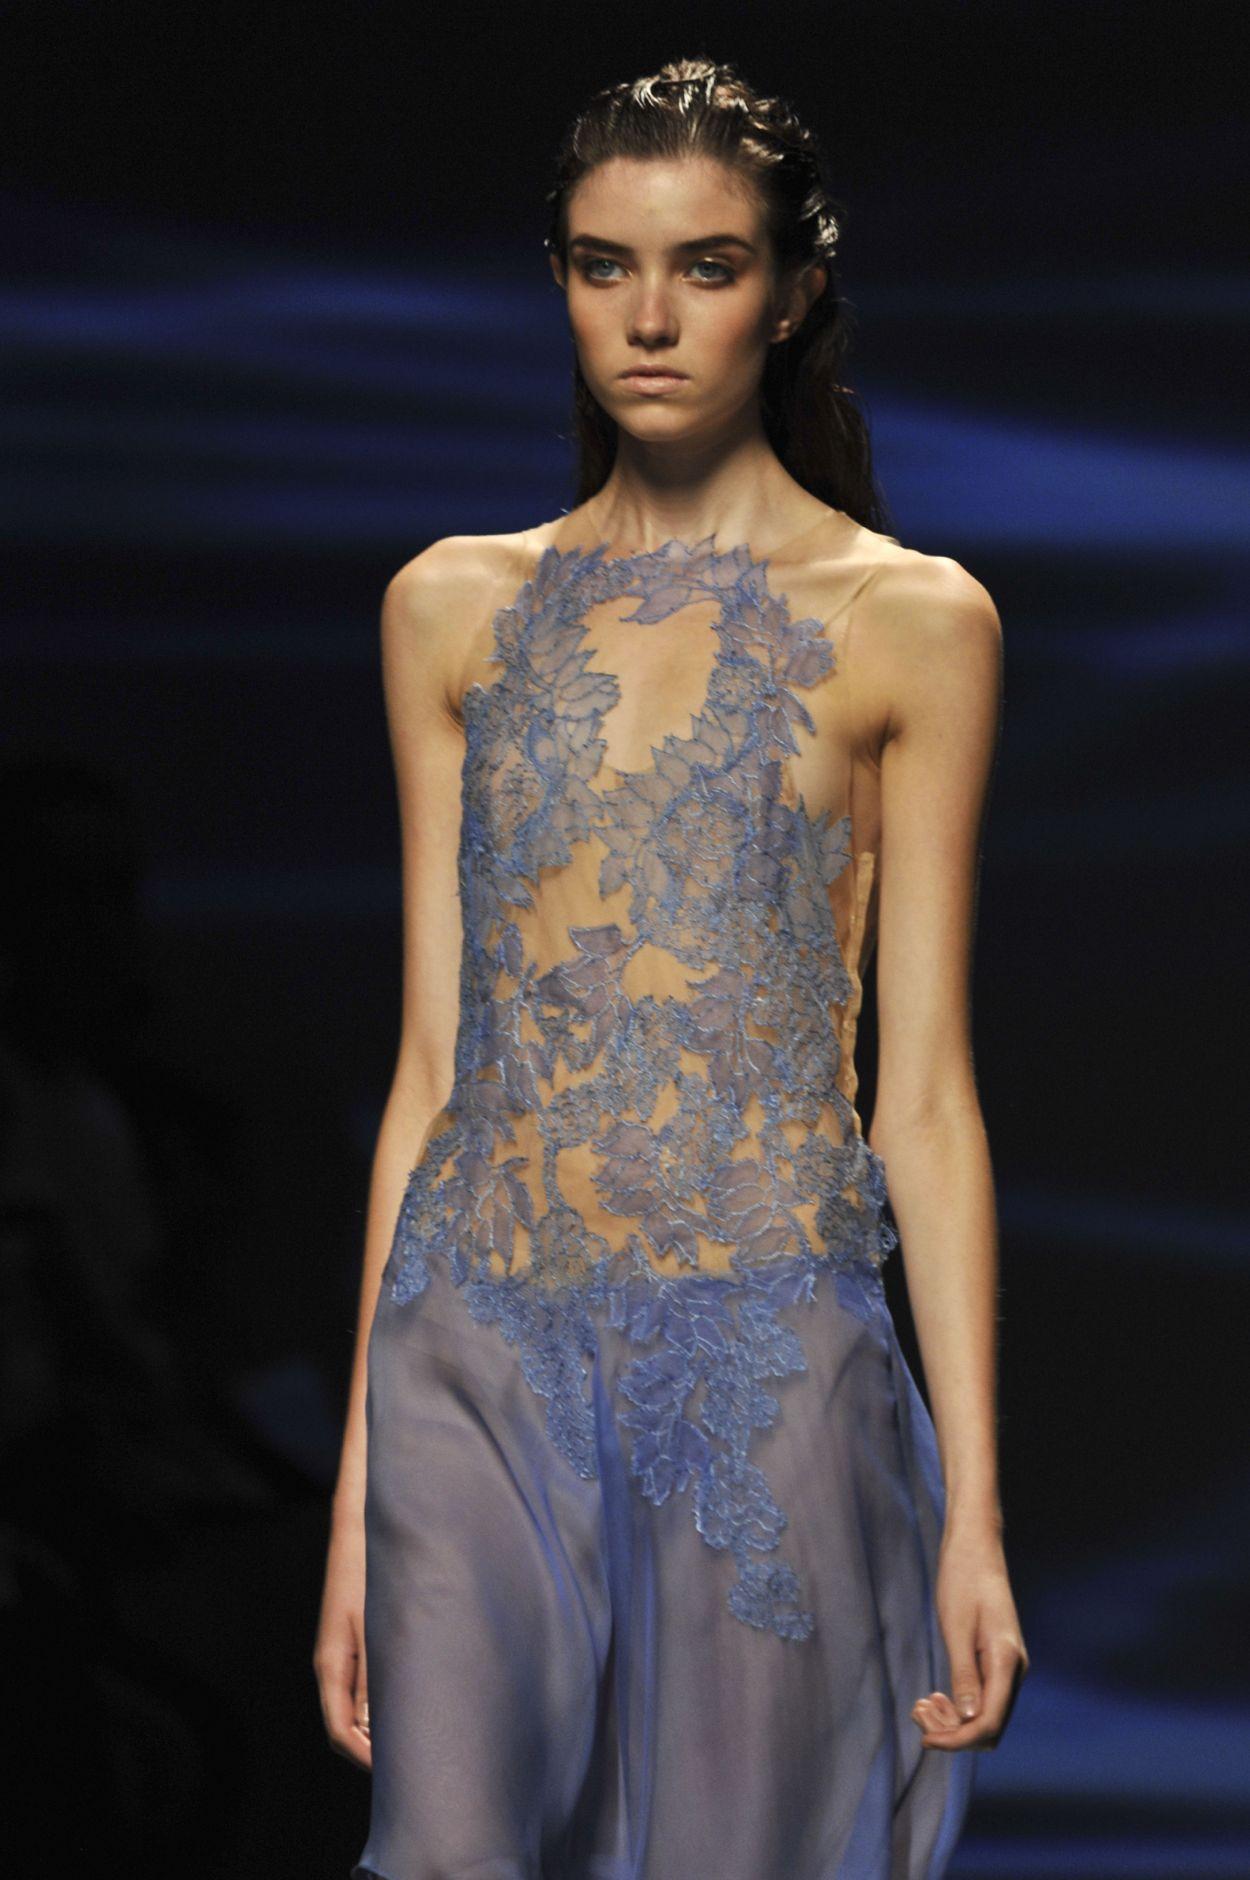 Alberta Ferretti Spring 2013 Collection Milan Fashion Week